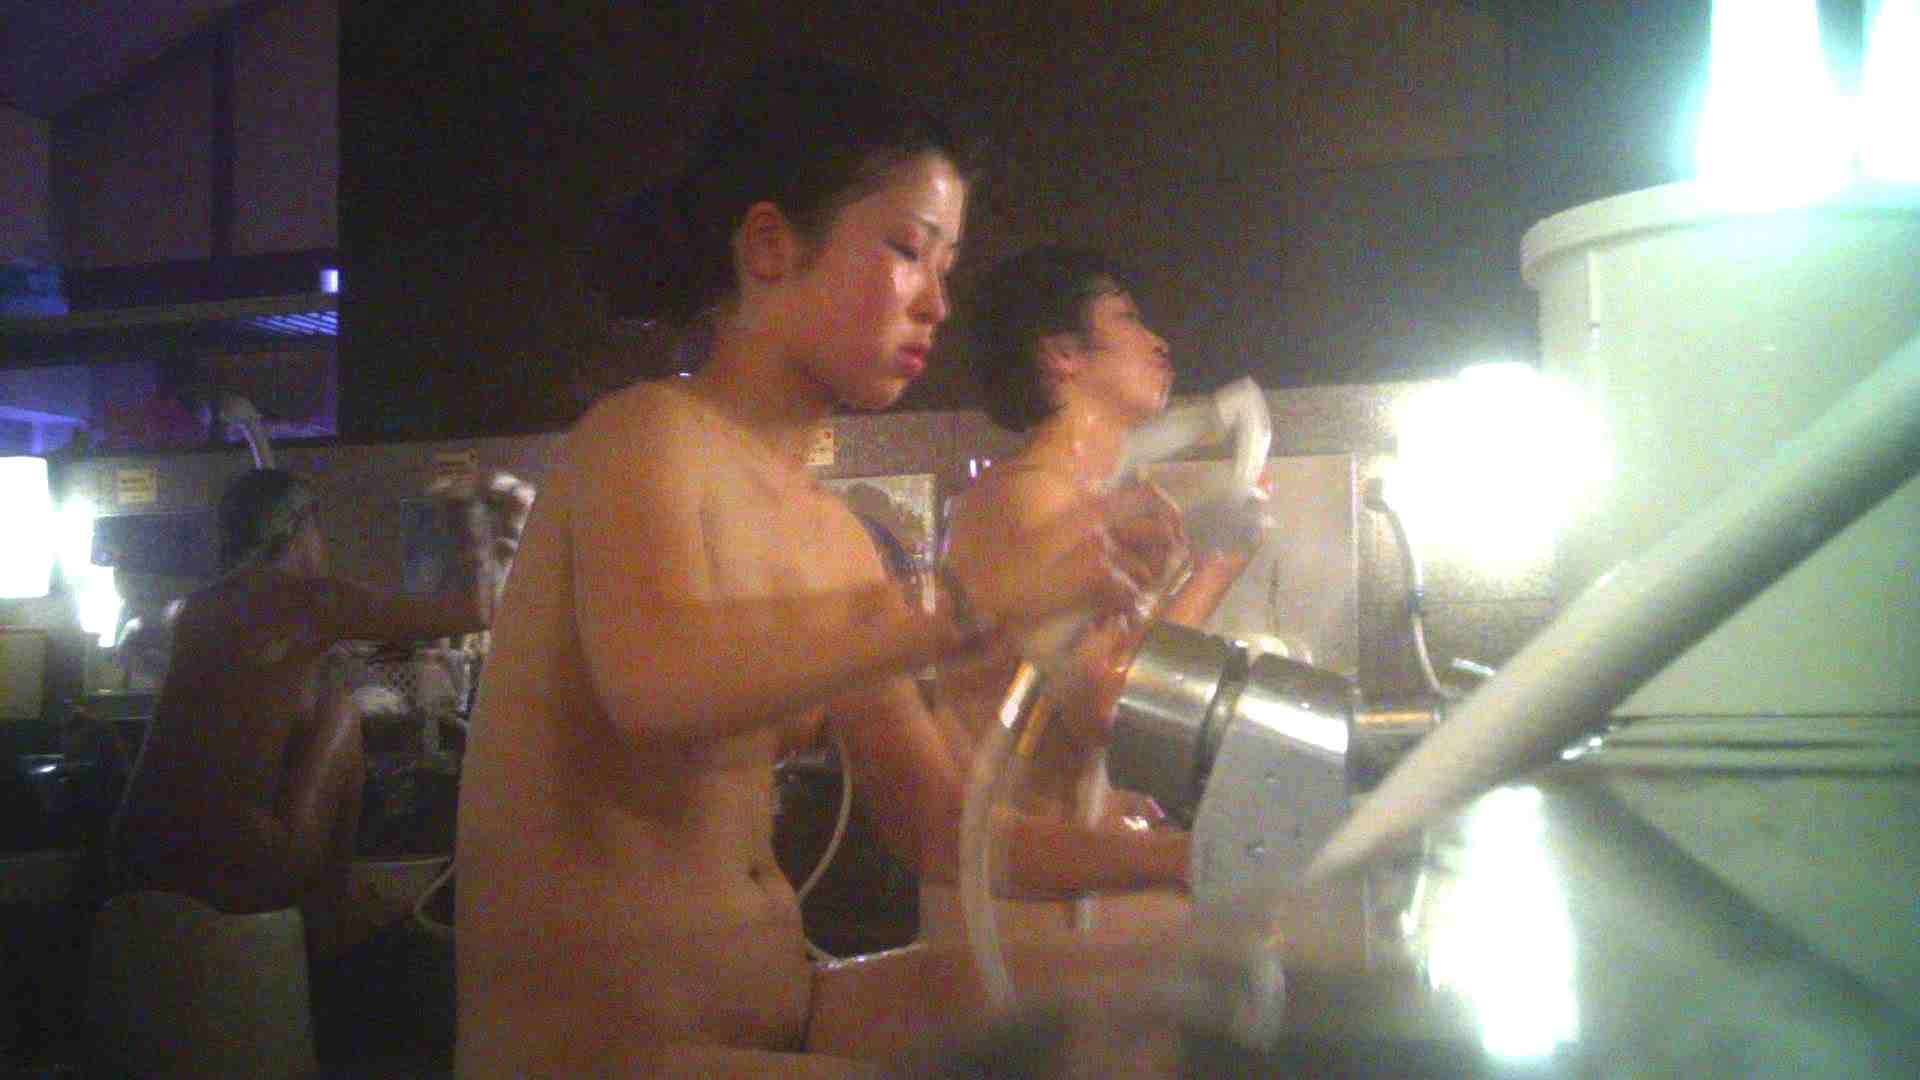 TG.01 【上等兵】お上品な女子大生の少し小さな胸をどうぞ 女湯 AV動画キャプチャ 66画像 60